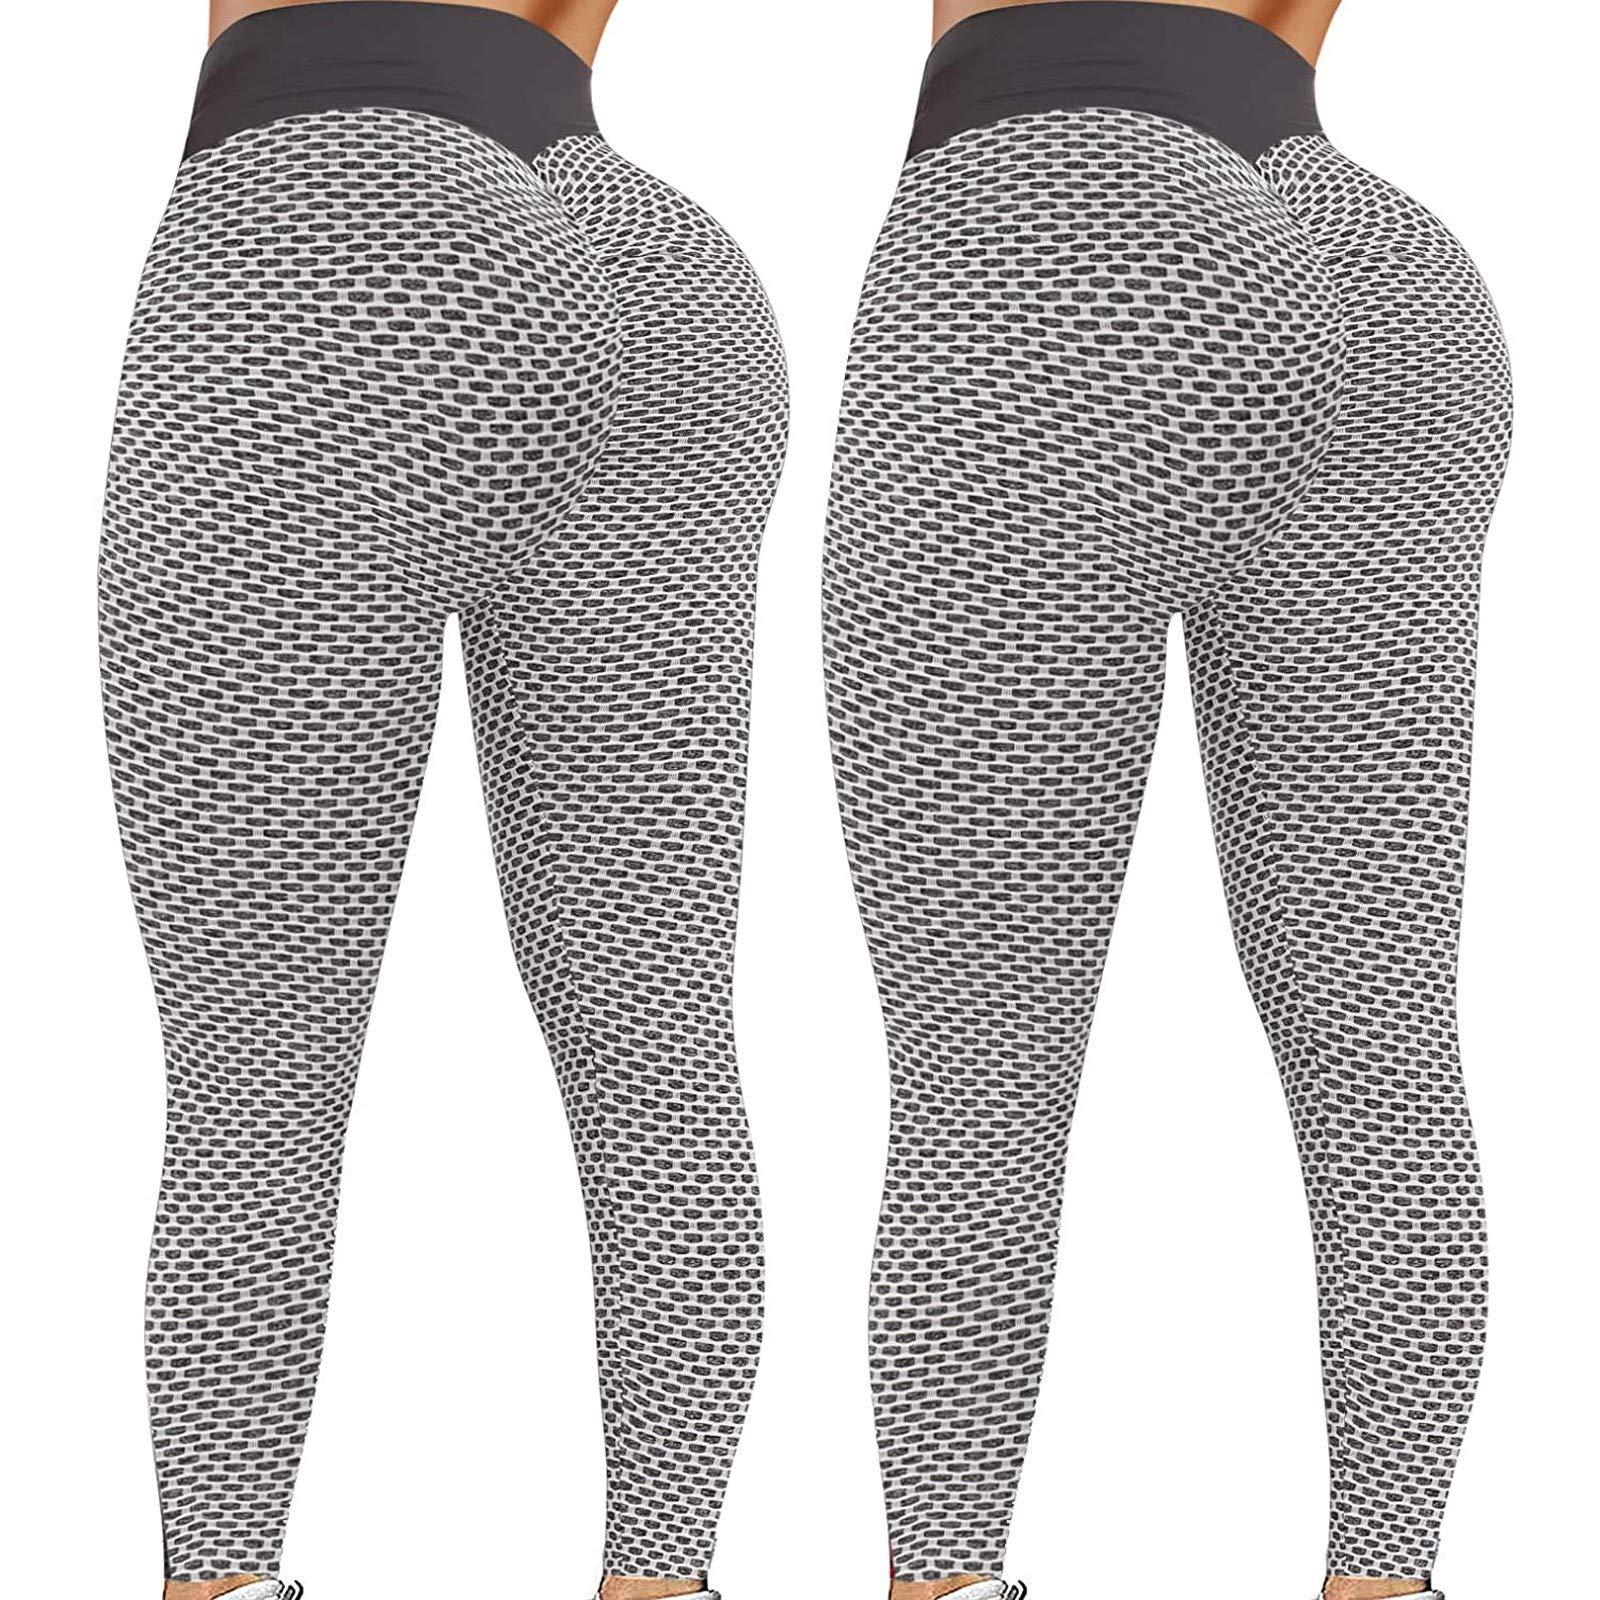 2Pcs Women's High Waist Yoga Pants Booty Lifting TIK Tok Butt Lift Leggings